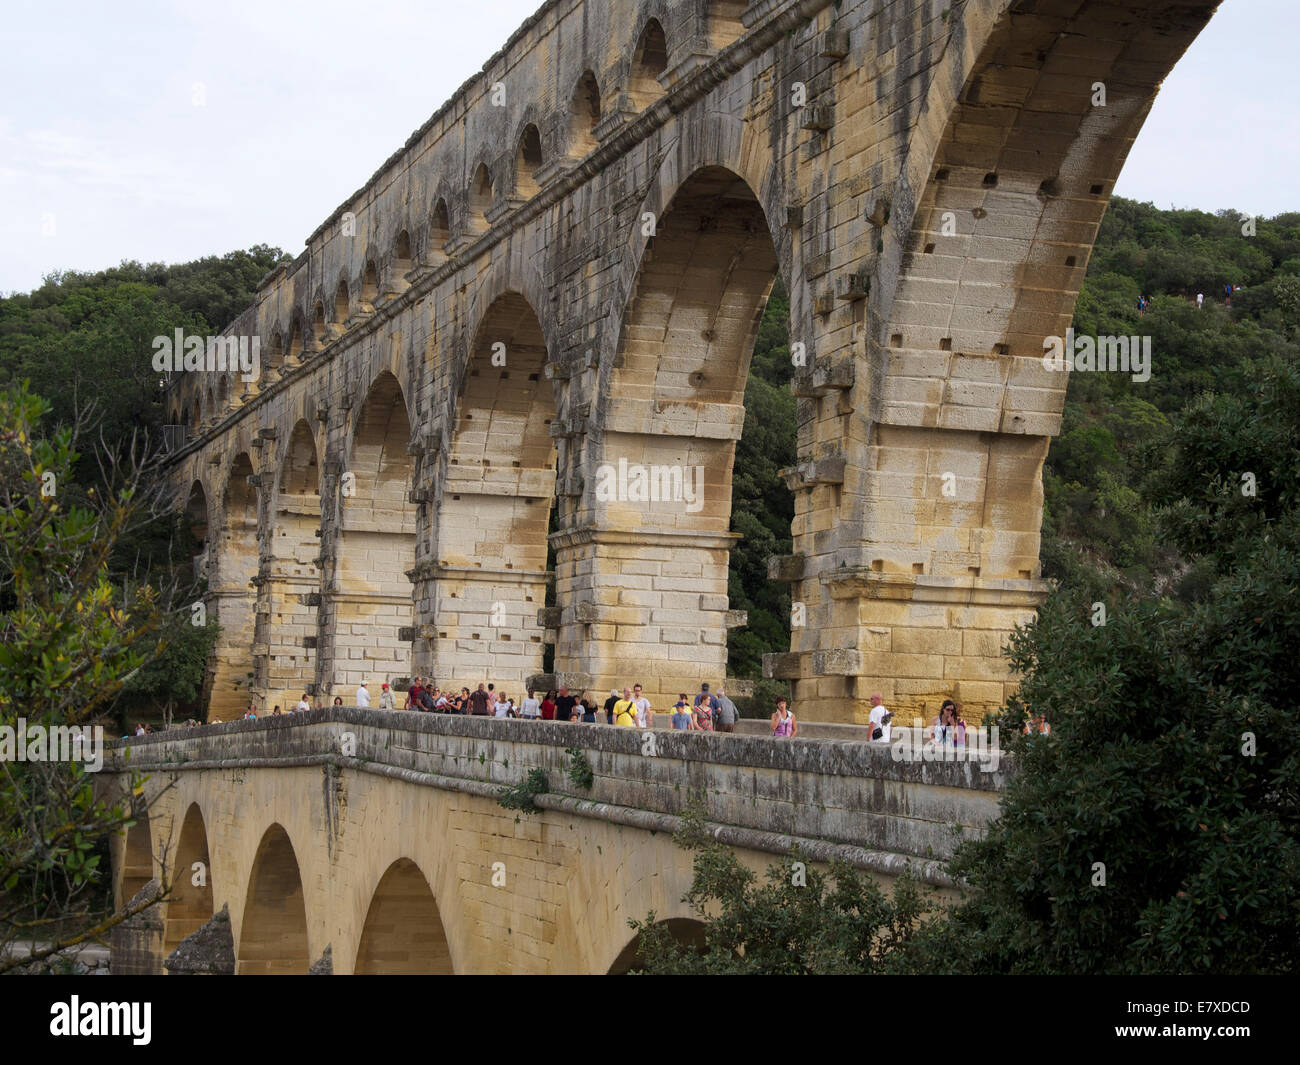 Il Pont du Gard, acquedotto romano, Gard, Languedoc-Roussillon, Francia, Europa Immagini Stock